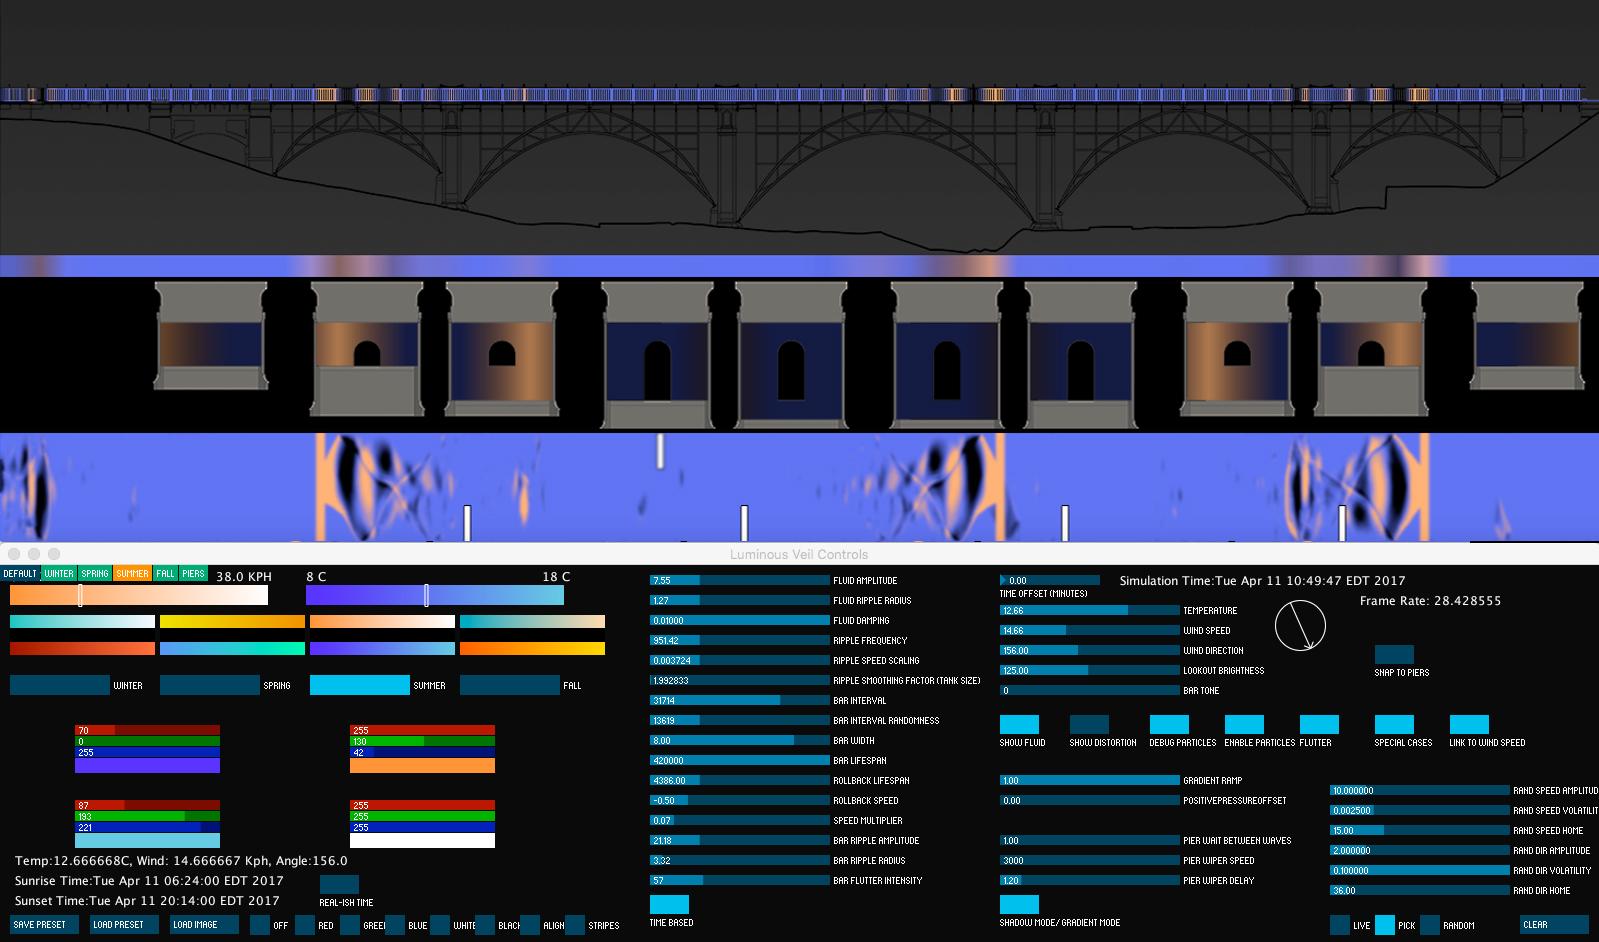 Dereck Revington Studio - The Luminous Veil - Interface Screenshot